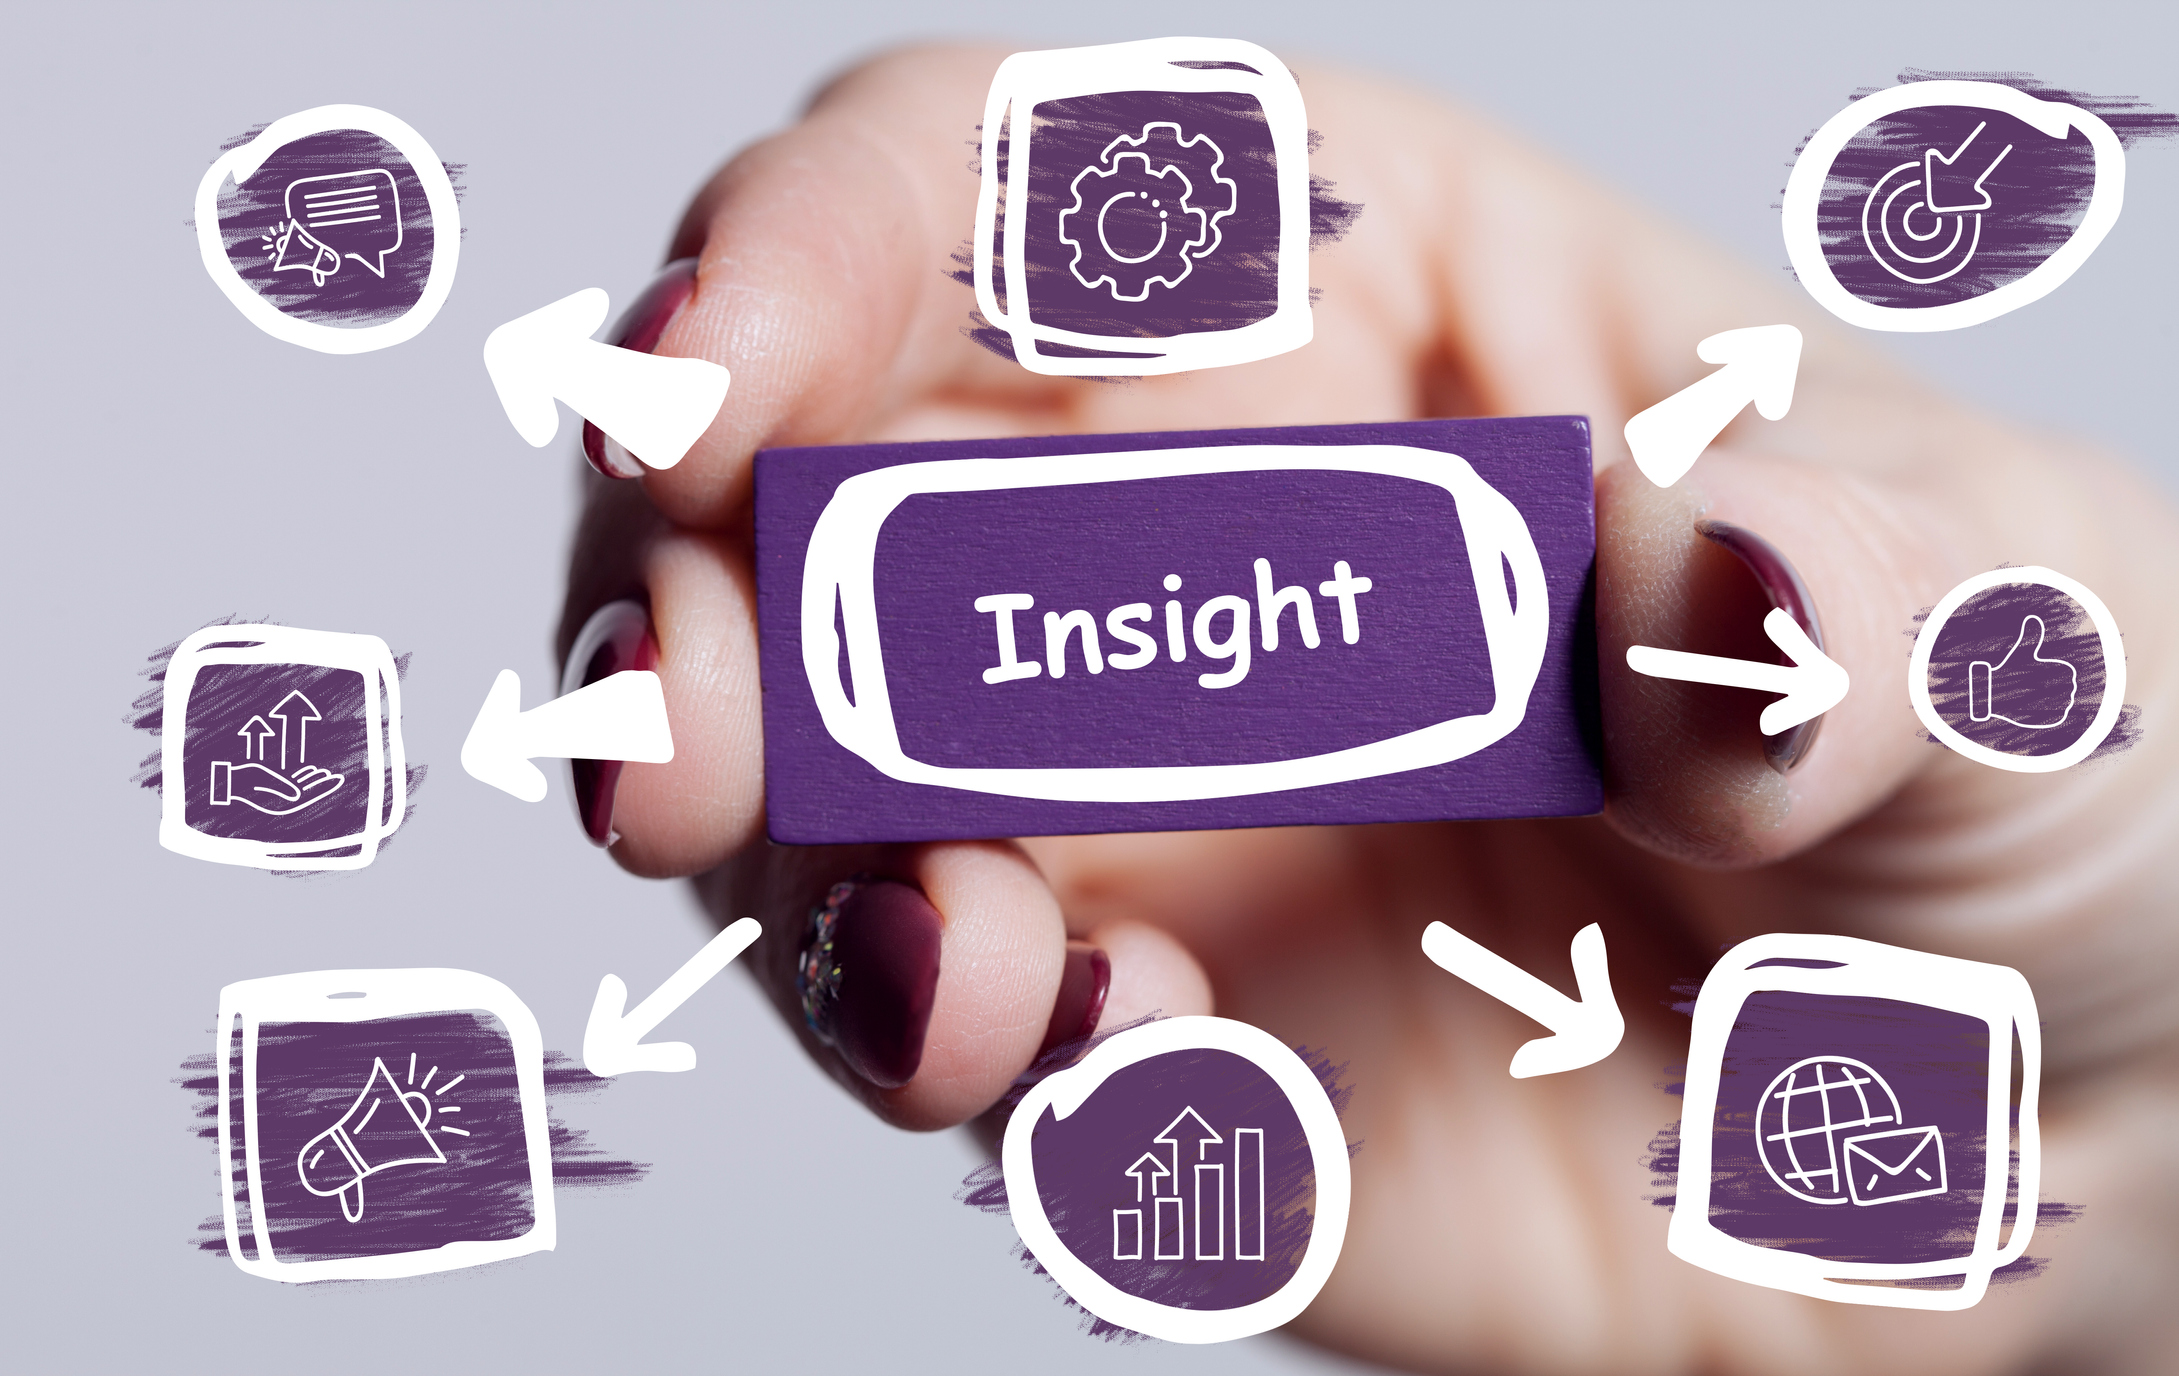 Customer Insights ed tech